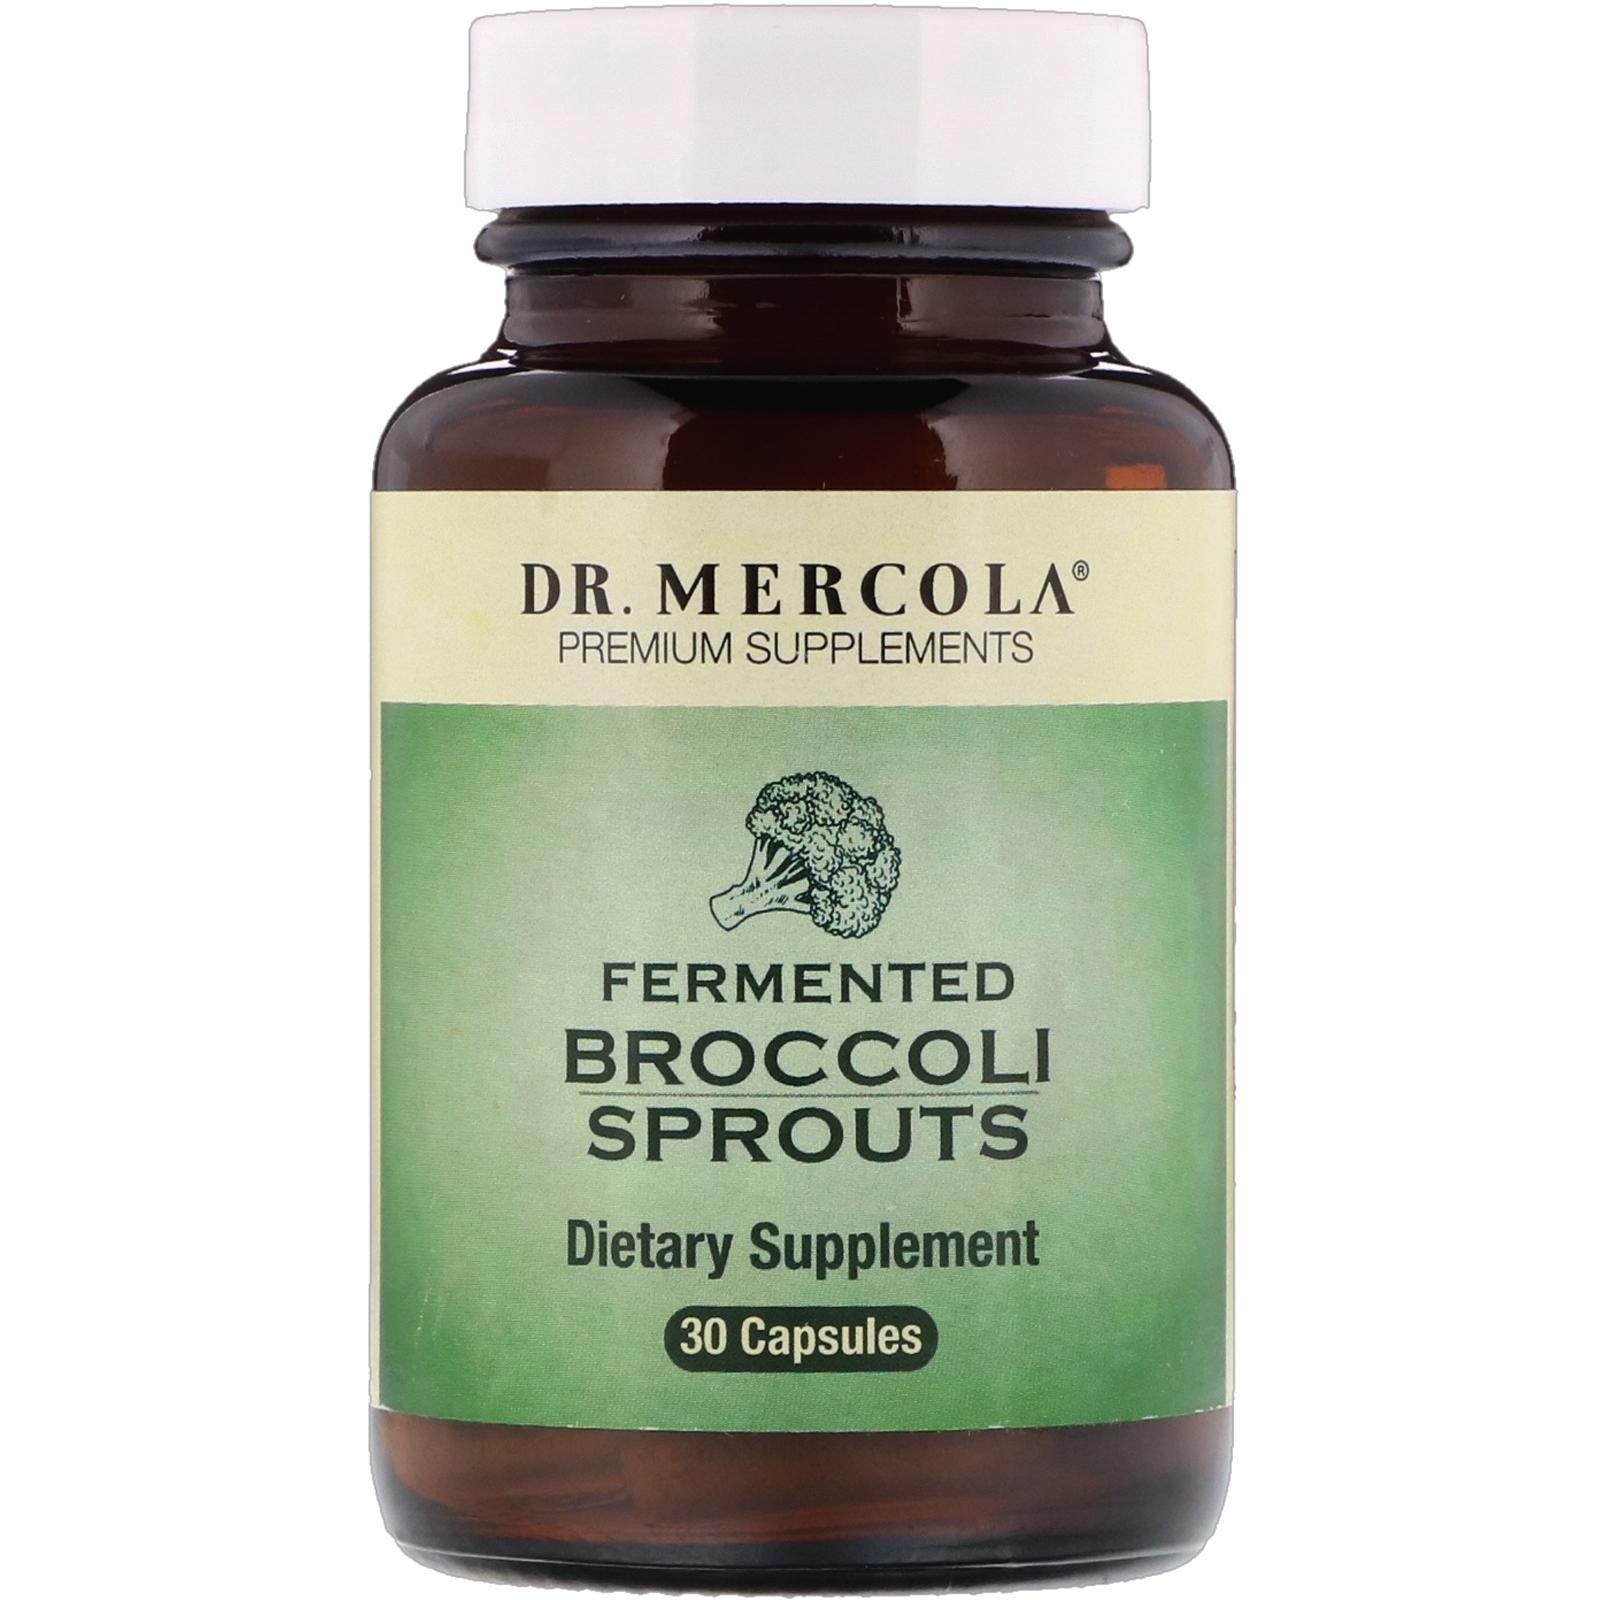 Fermented Broccoli Sprouts (30 Capsules) Dr. Mercola